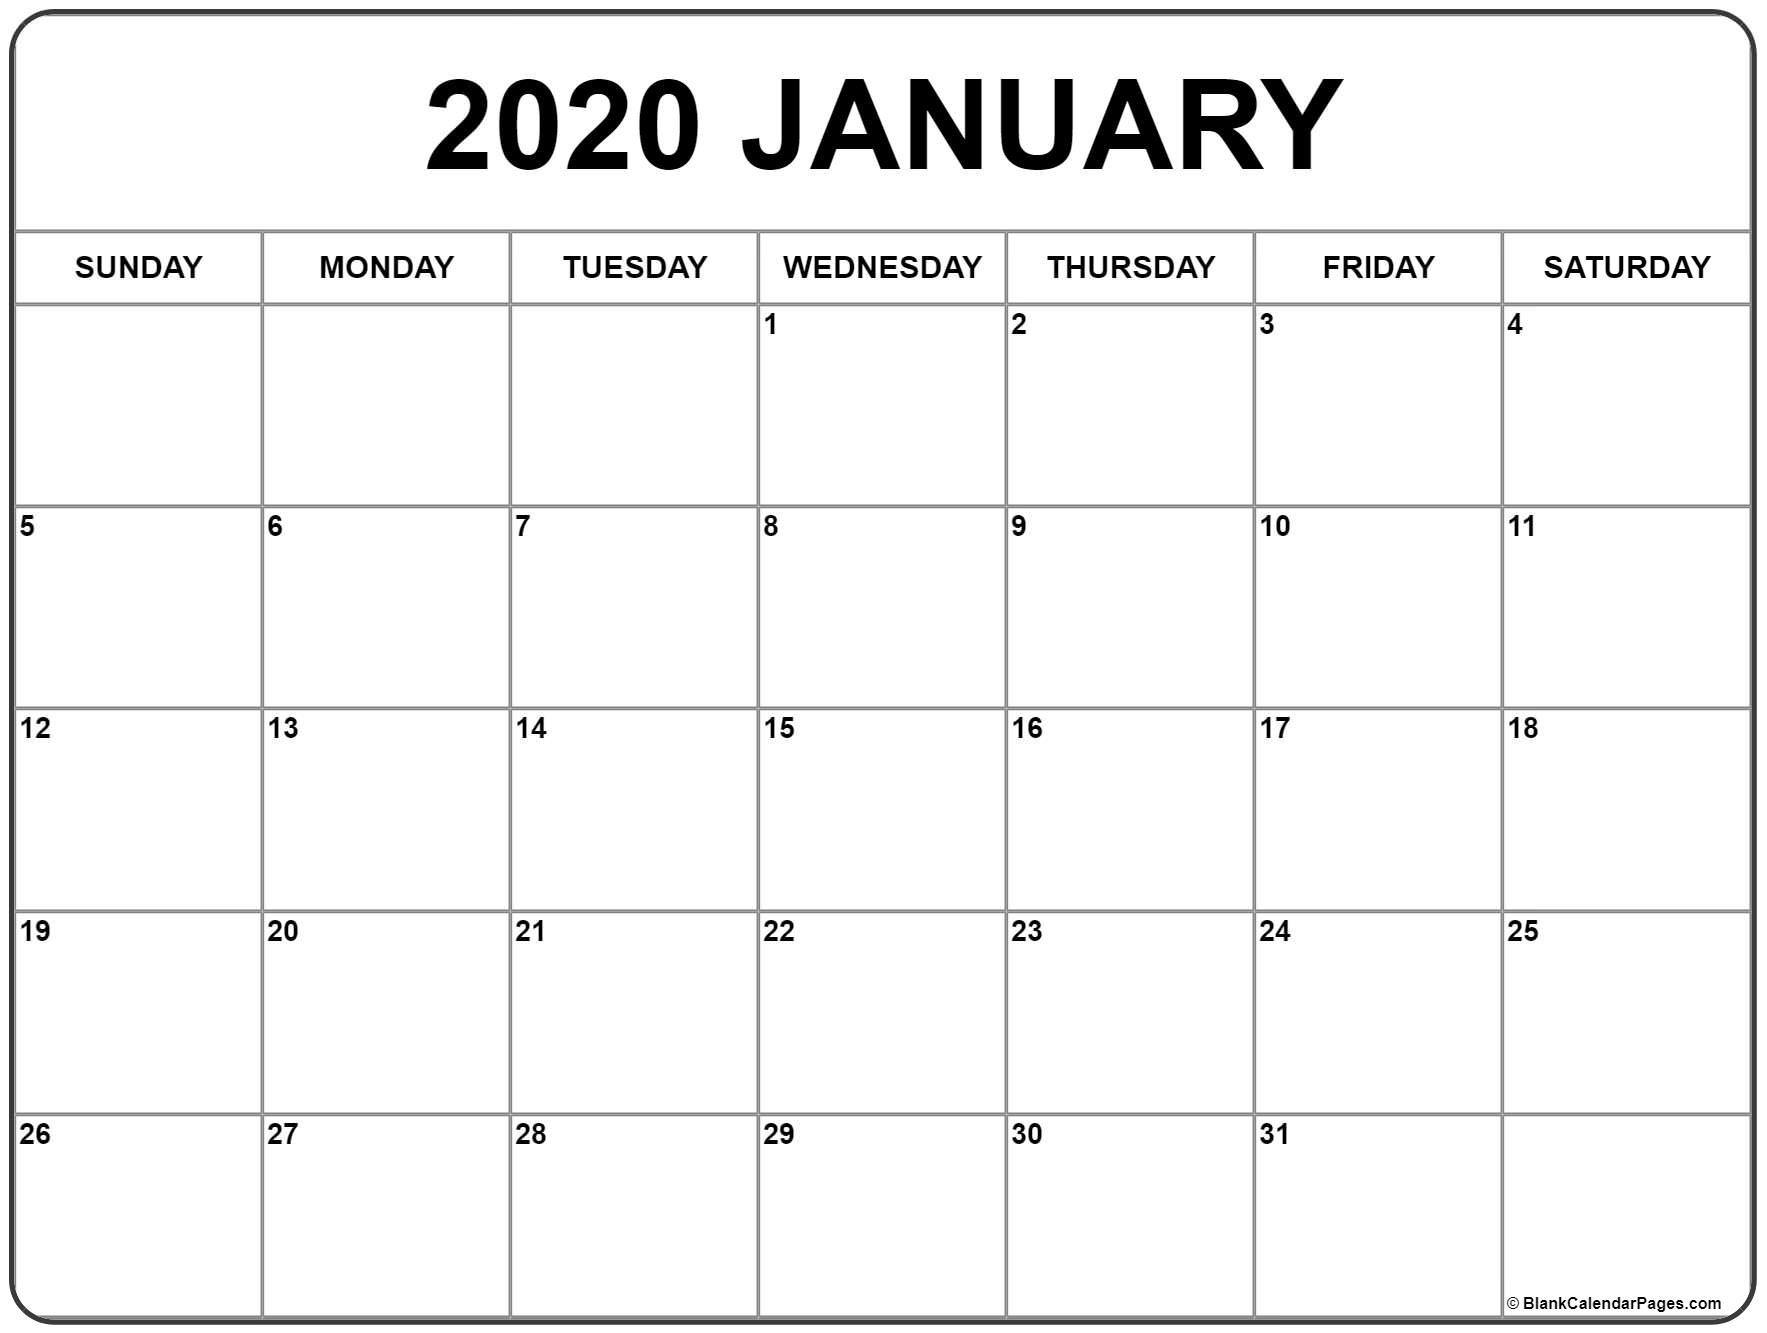 2020 Blank Calendar Template - Togo.wpart.co